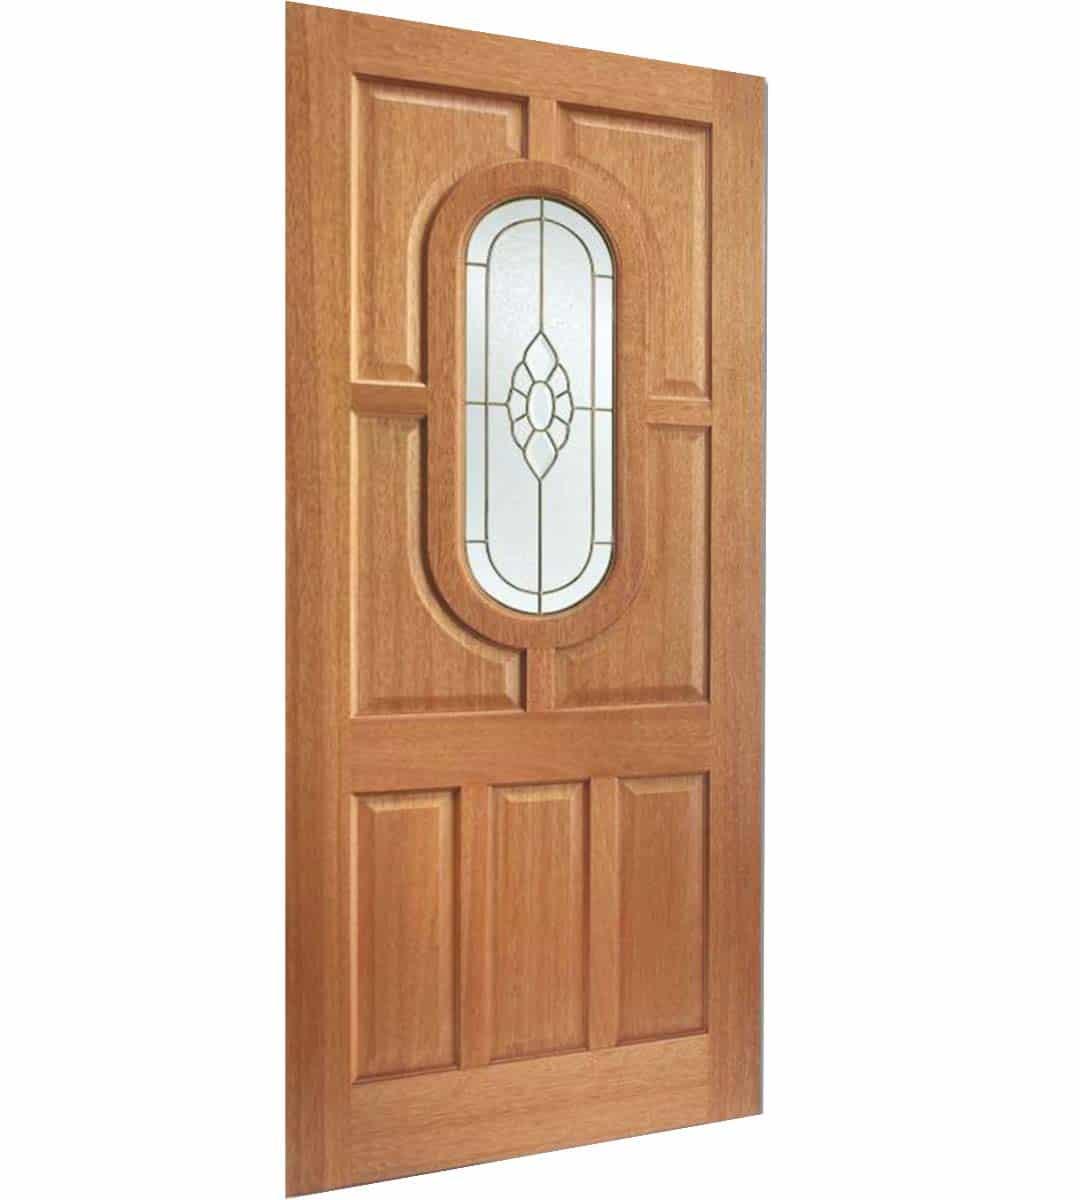 acacia hardwood external door with obscure glass